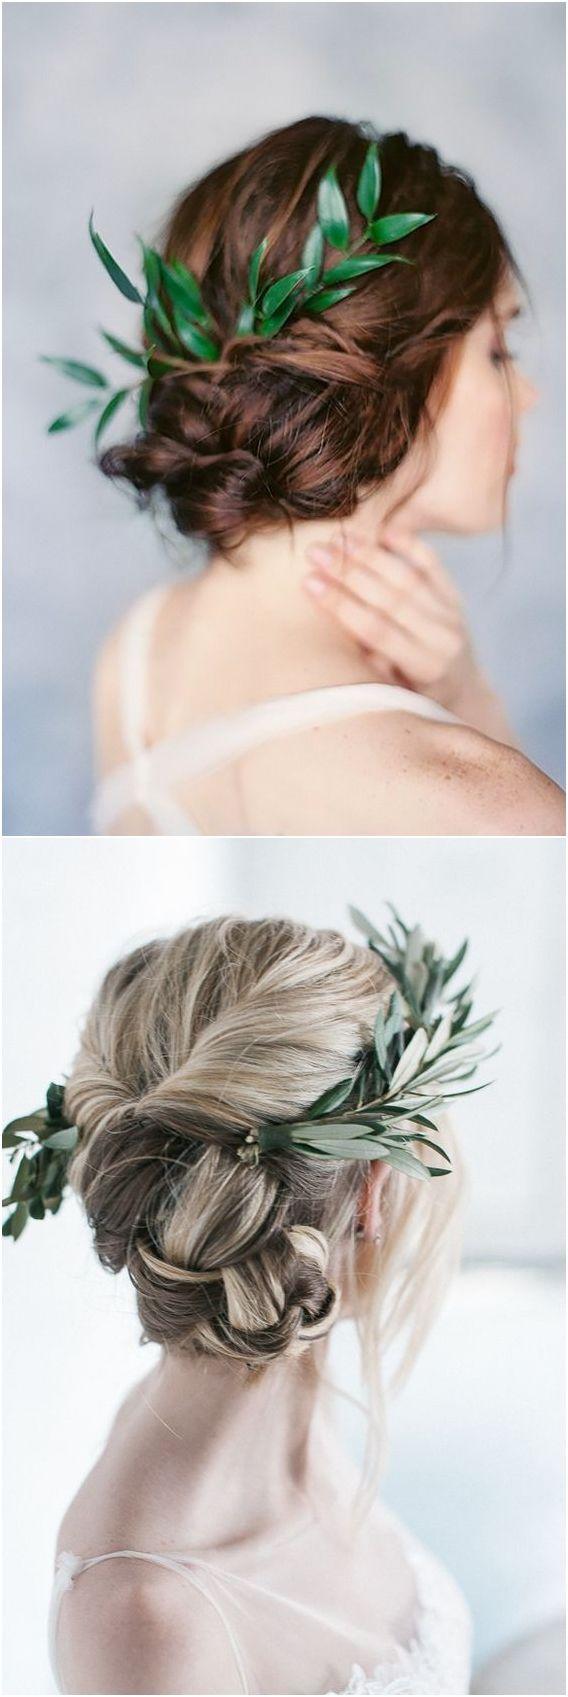 Long wedding hairstyles with greenery #wedding #weddingideas #hairstyles http://www.deerpearlflowers.com/wedding-hairstyles-with-flower-crowns/